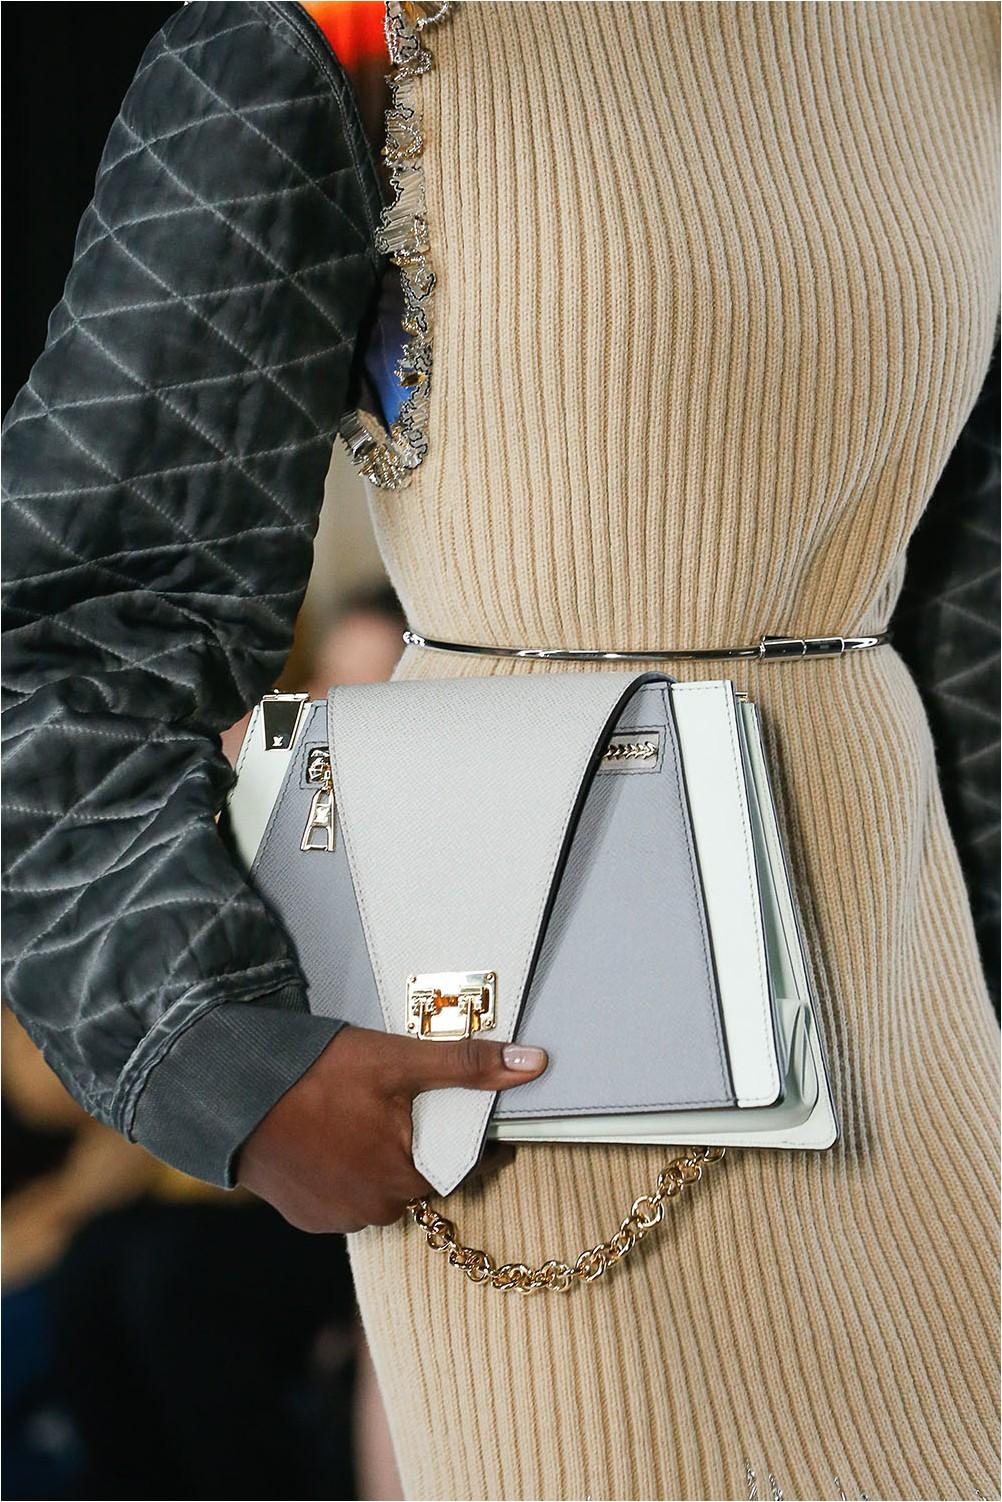 Louis Vuitton will send